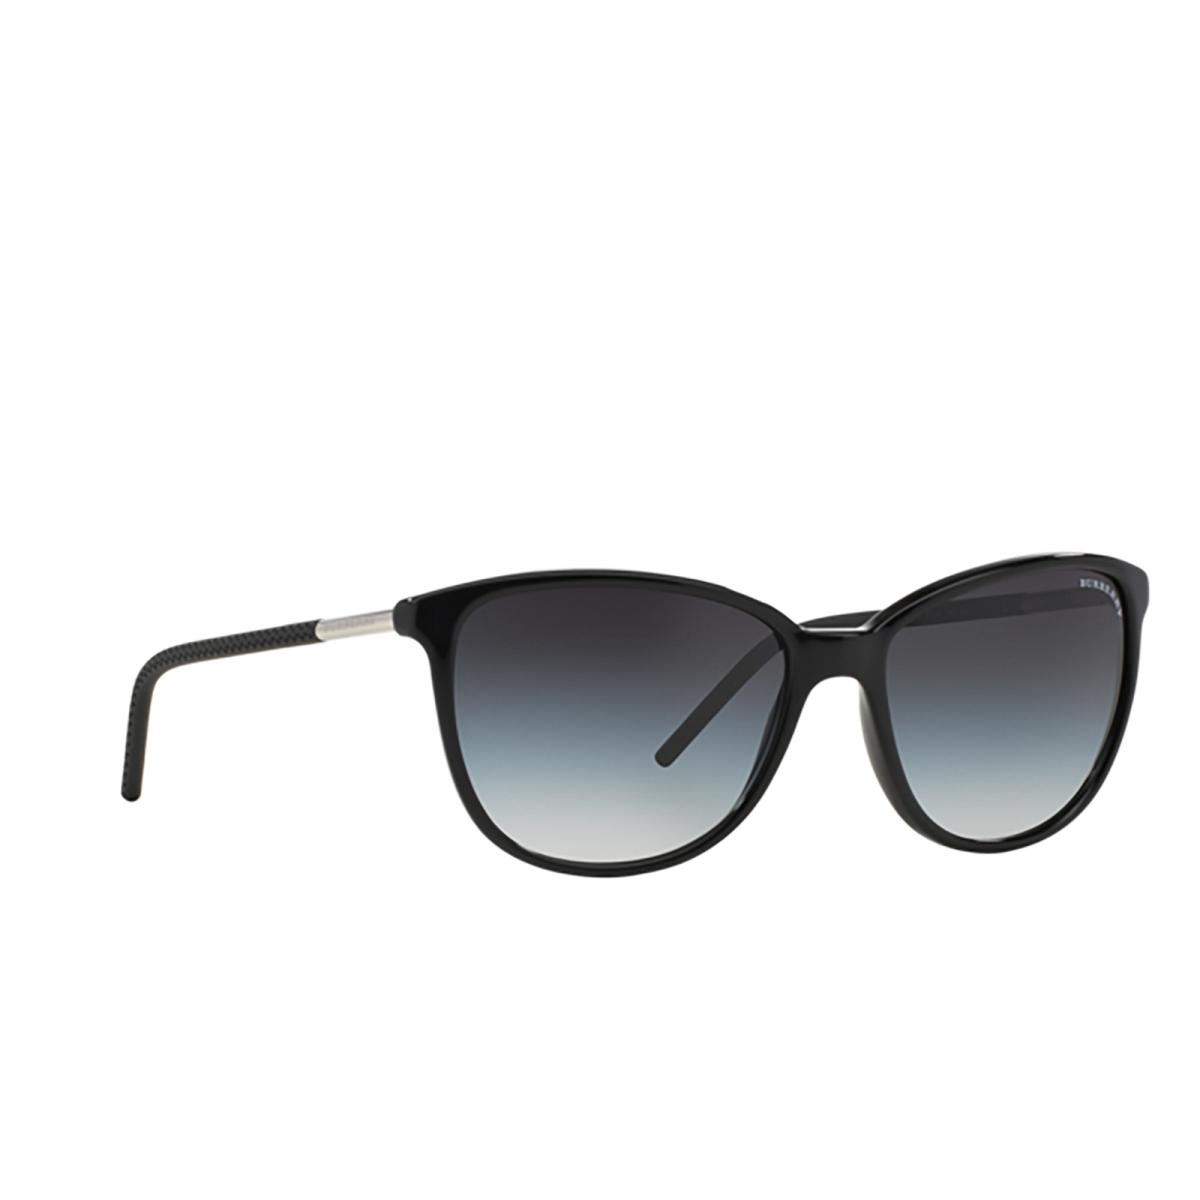 Burberry® Cat-eye Sunglasses: BE4180 color Black 30018G - three-quarters view.